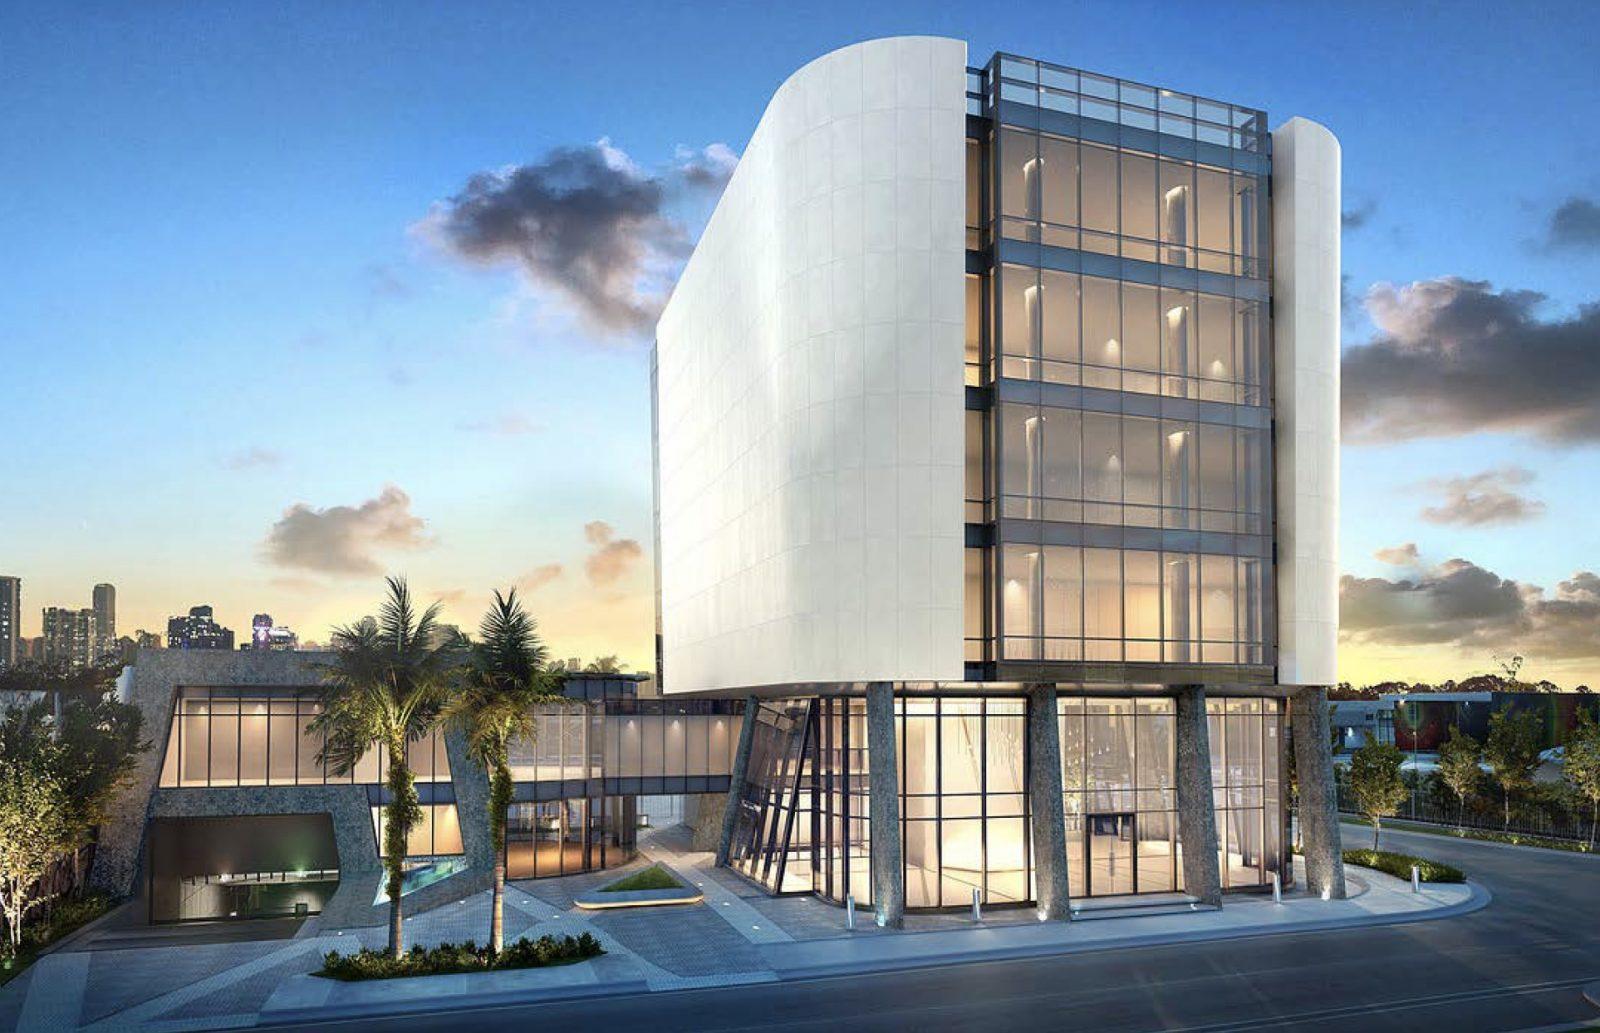 NeueHouse Miami - Courtesy of DesignAgency